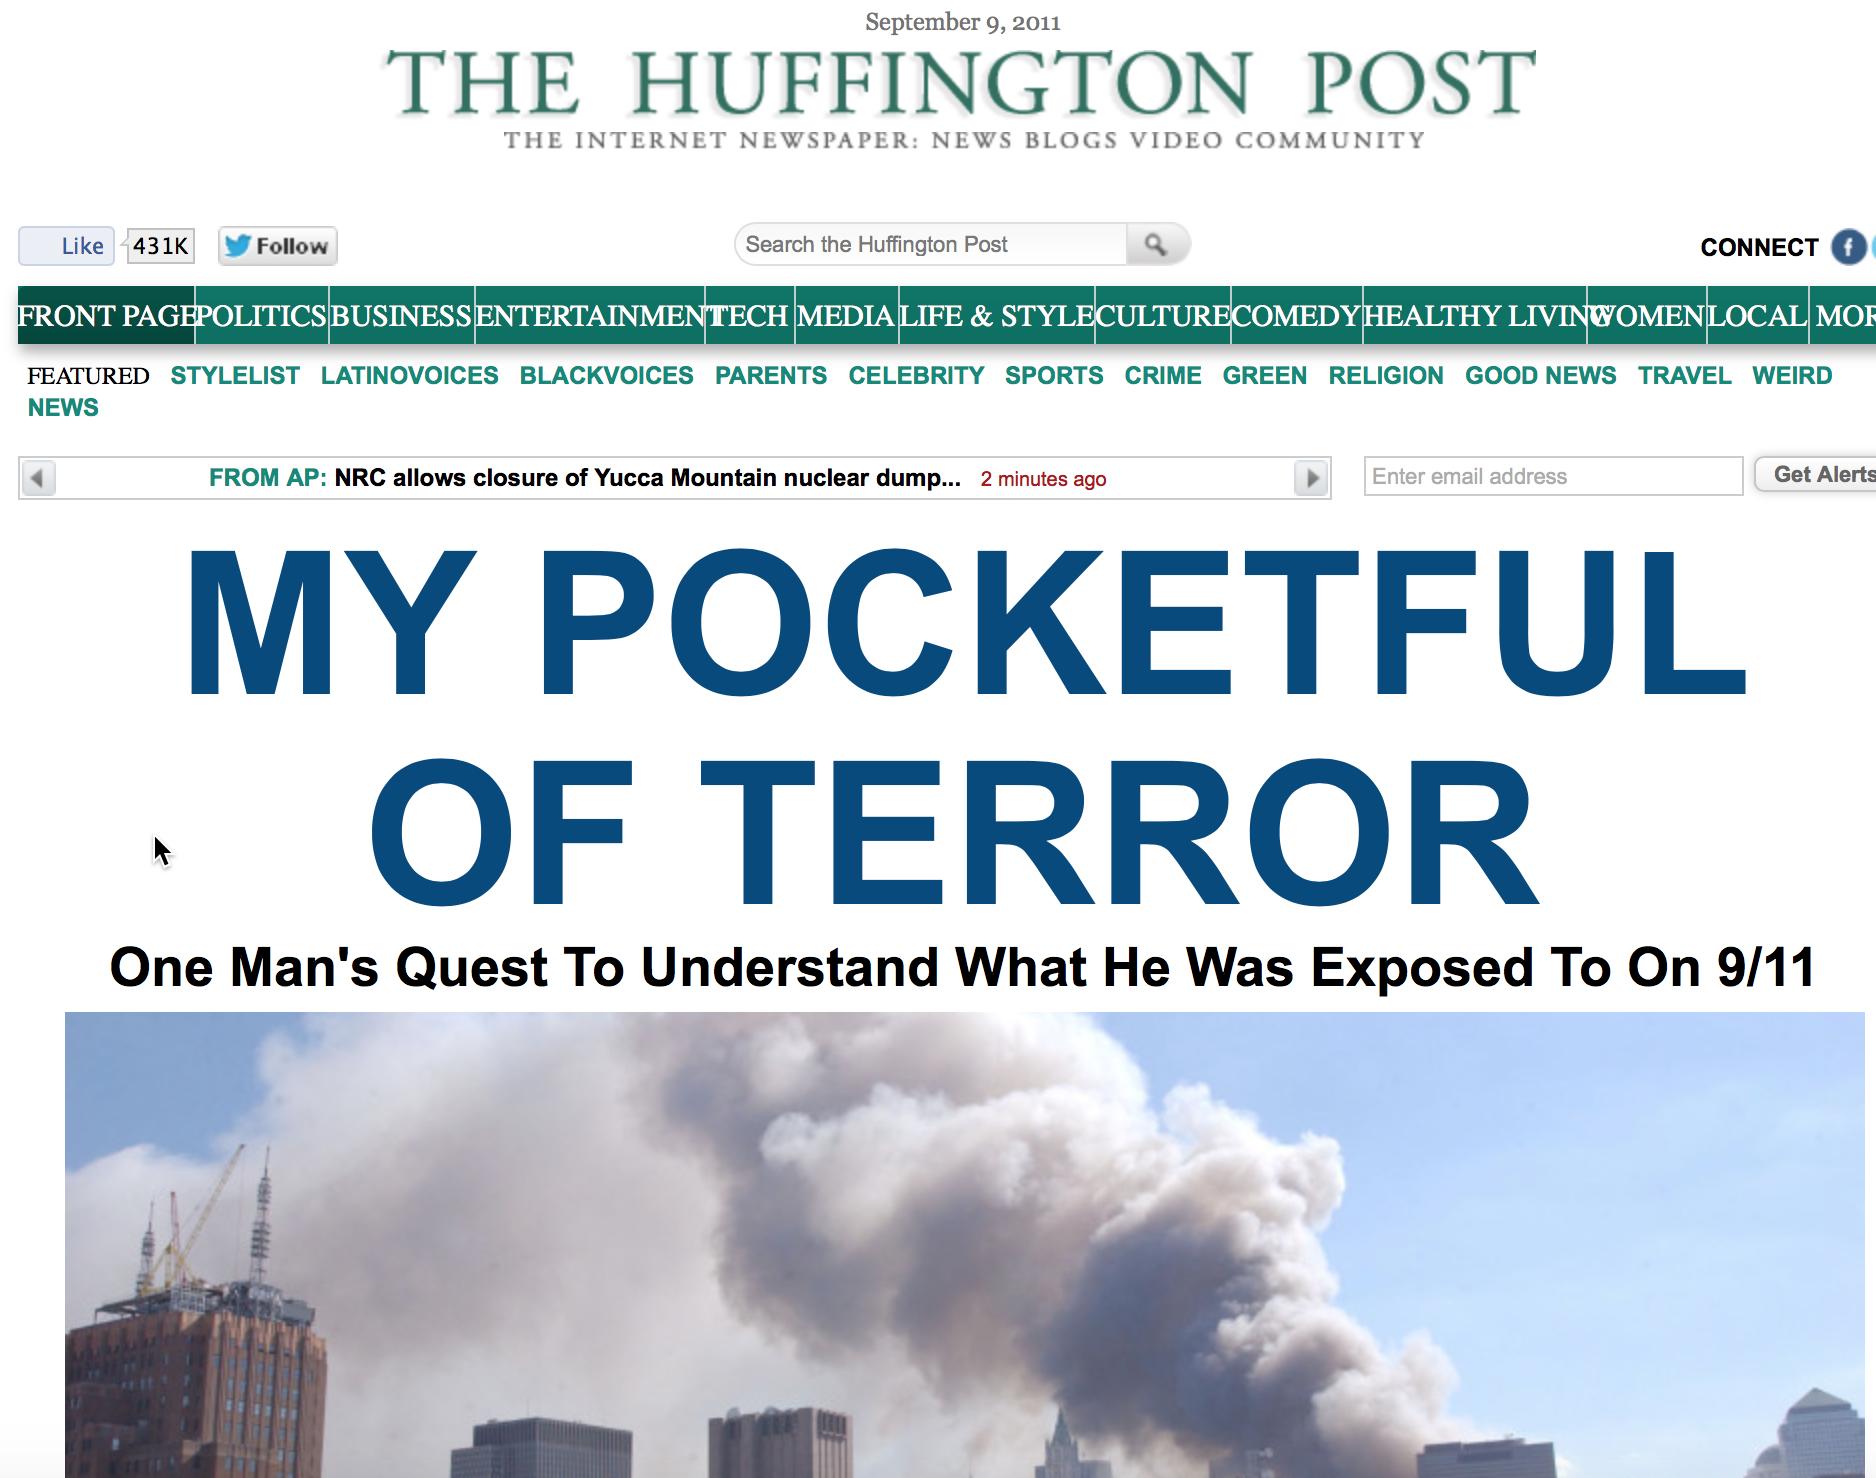 Pocketful of Terror splash